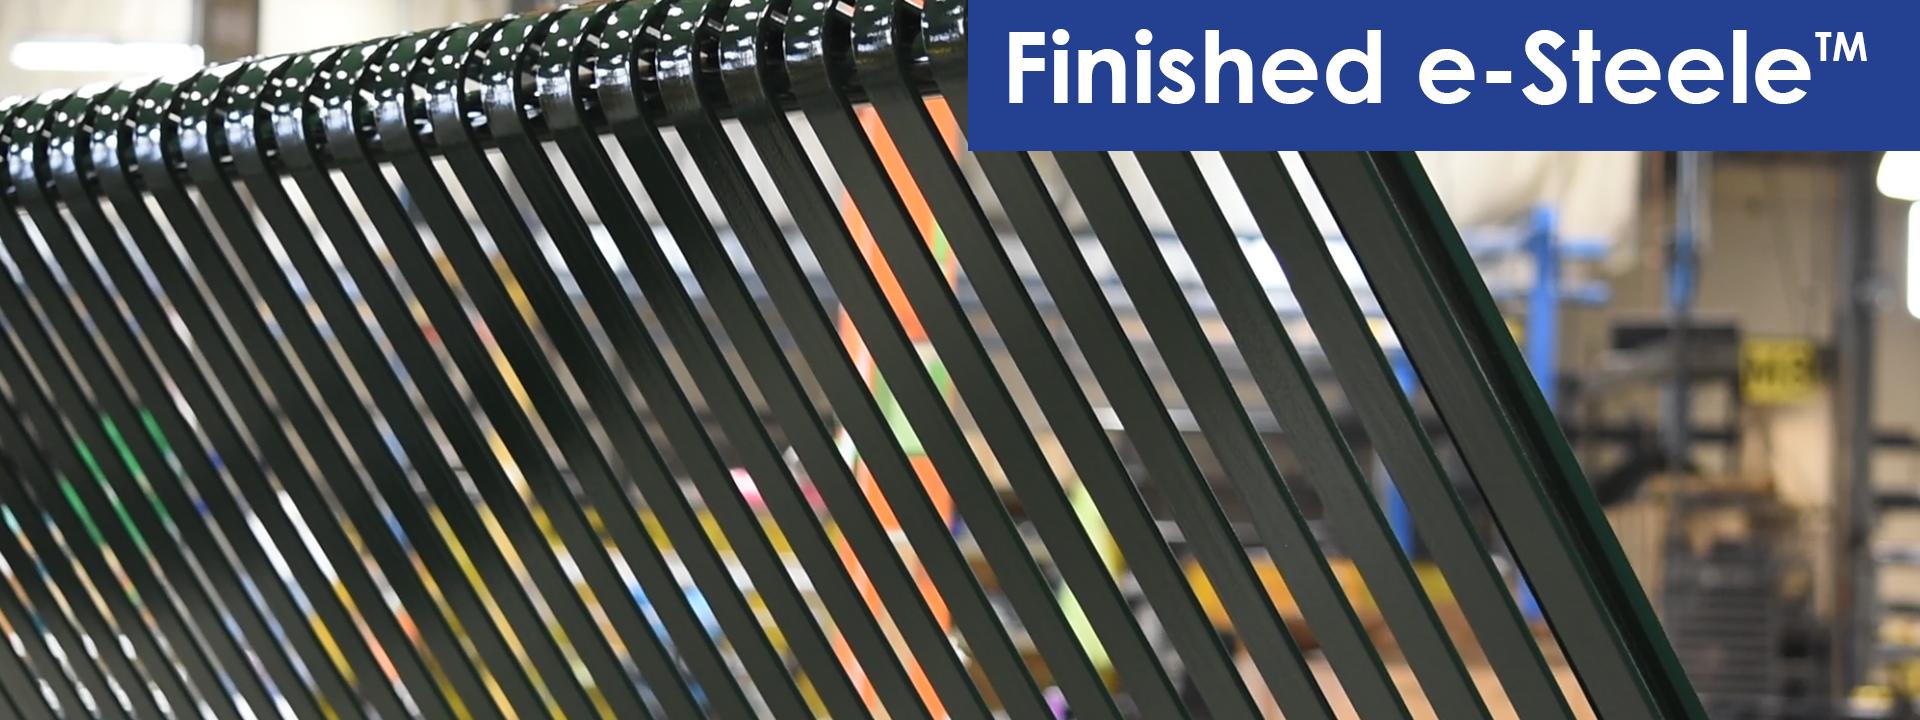 Finished-e-steele